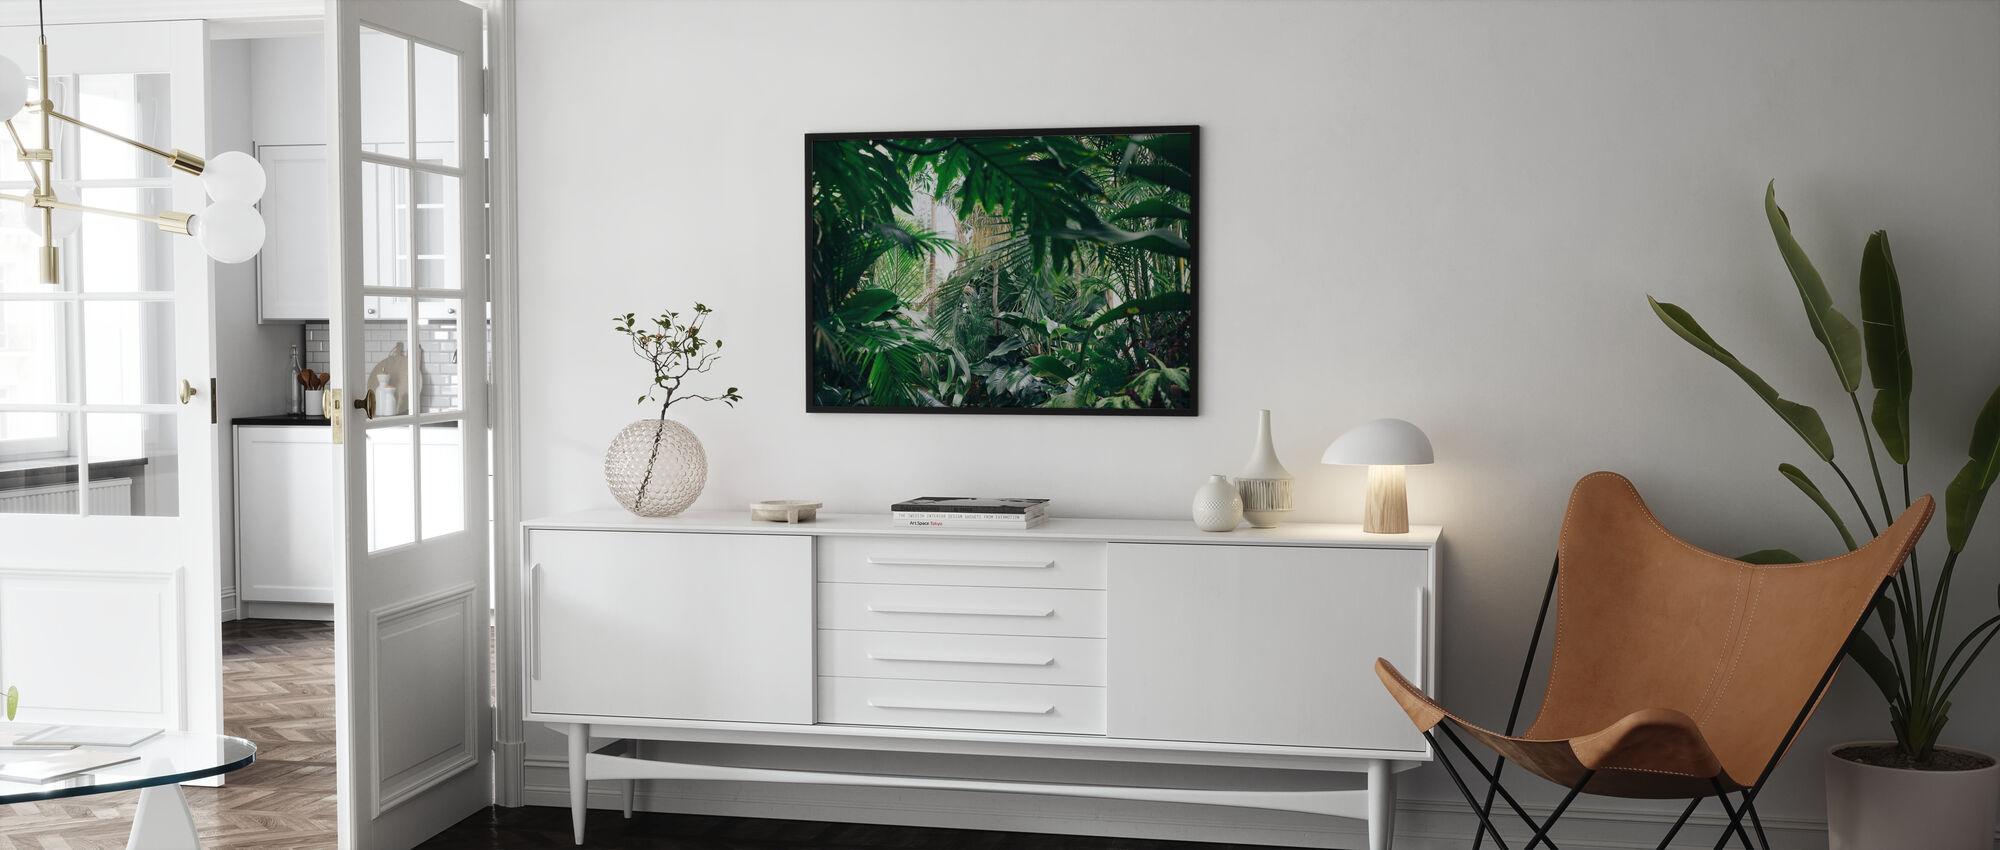 Jungle Planter - Innrammet bilde - Stue